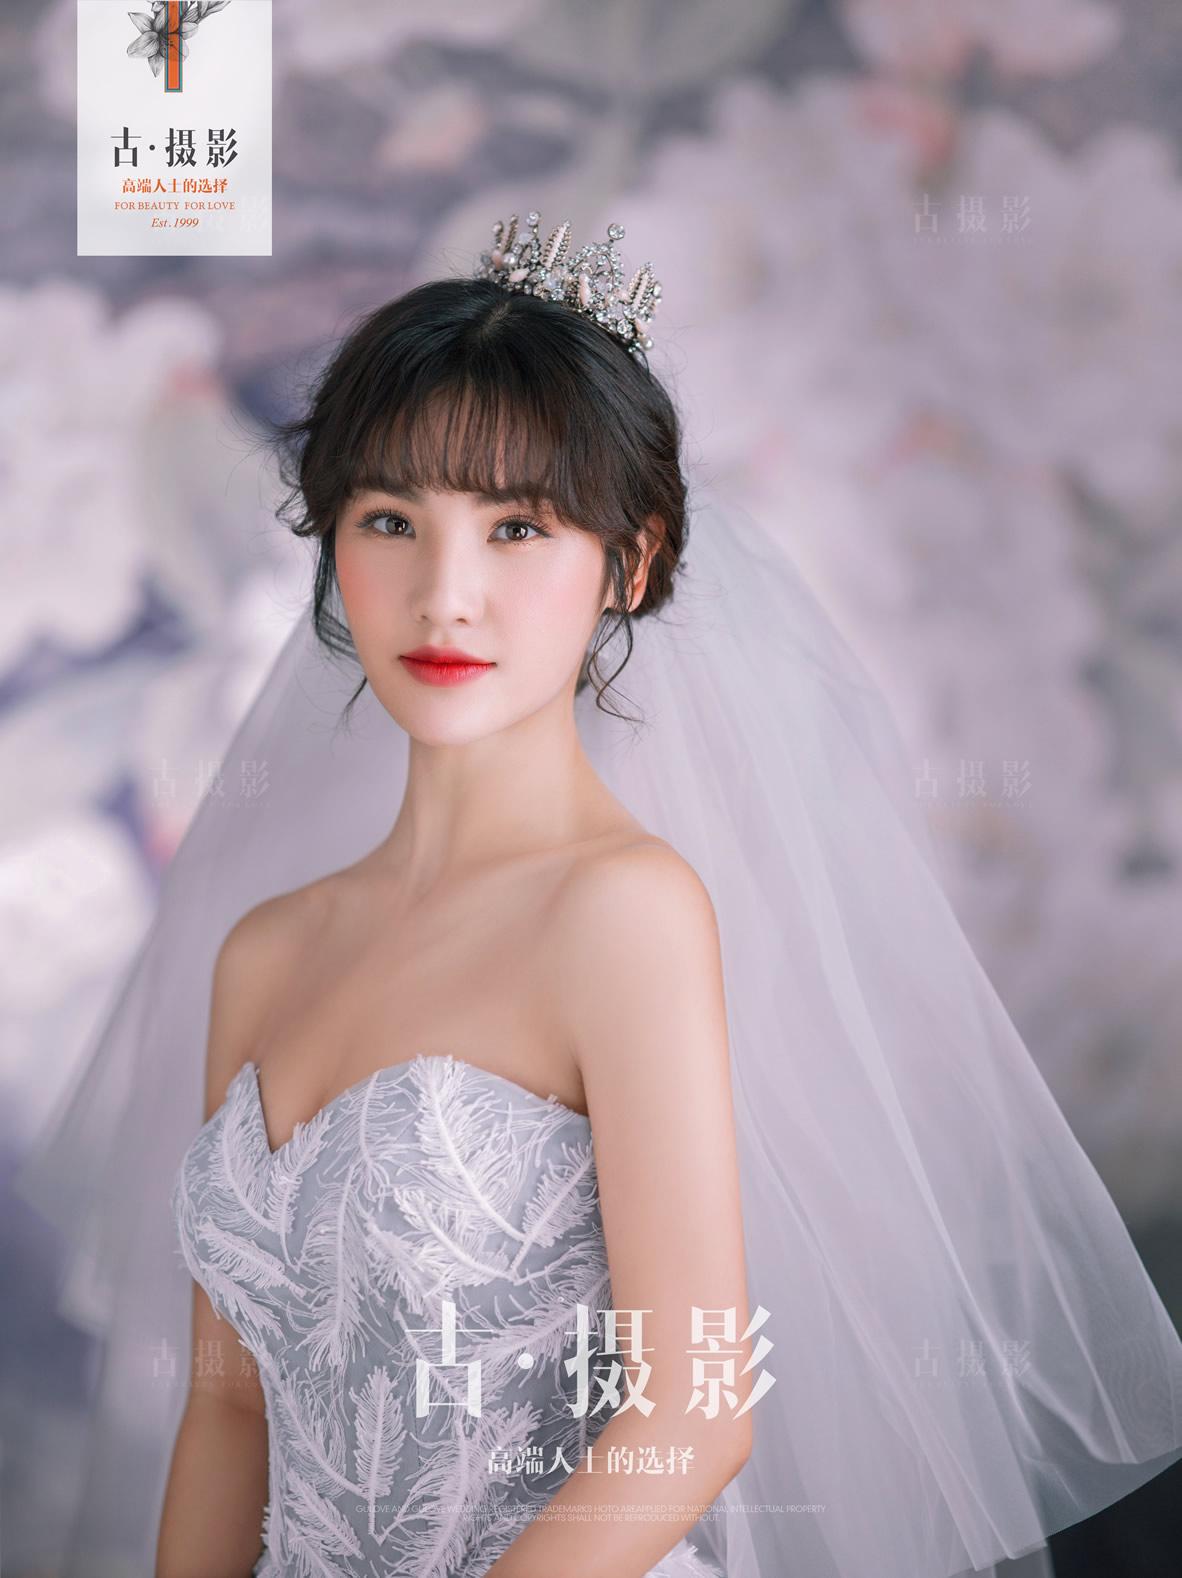 GRACE Ⅱ - 明星范 - love上海古摄影-上海婚纱摄影网